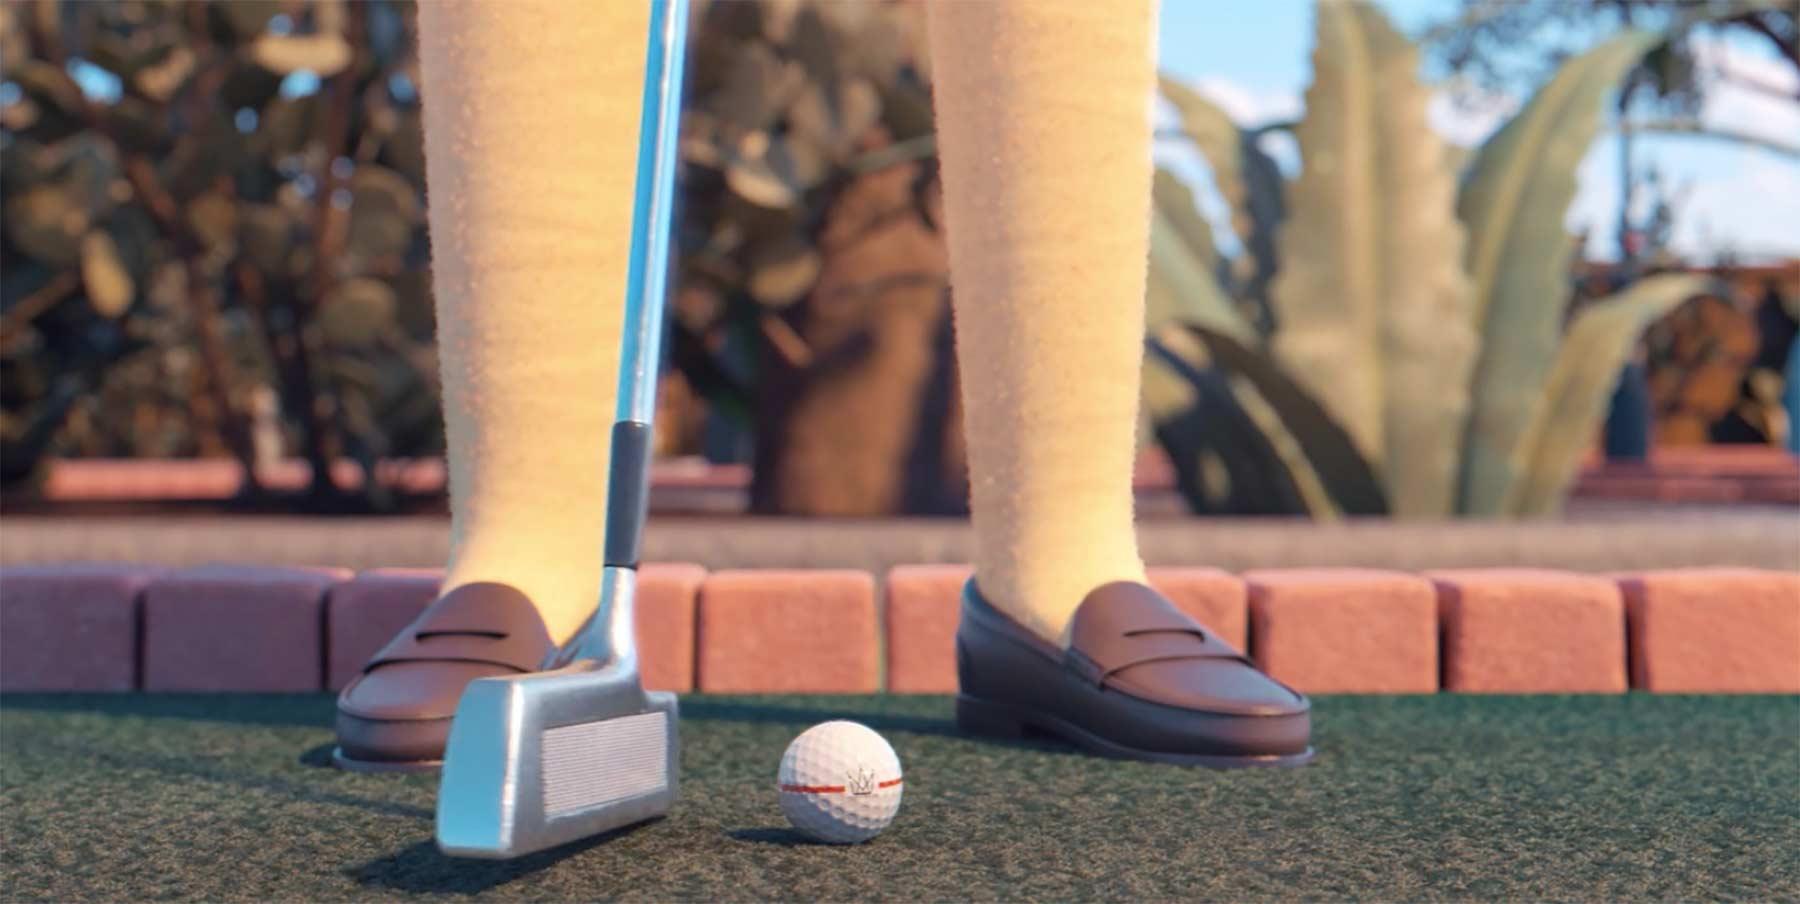 Schön animiertes Minigolf-Duell animierter-kurzfilm-play-off